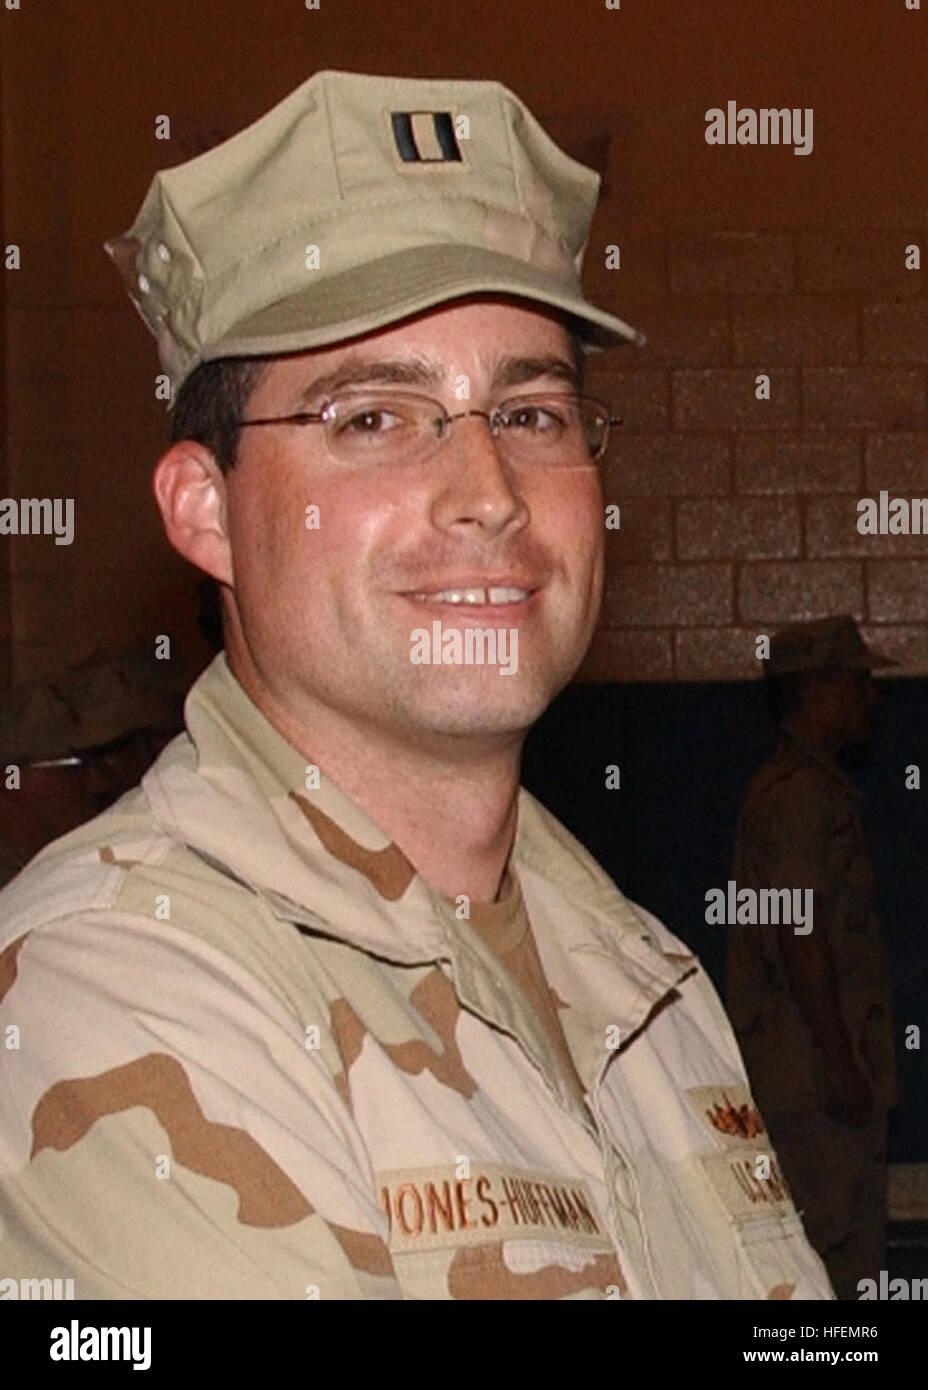 030825-N-7572F-001 Manama, Bahrain (Aug. 25, 2003) -- Lt. Kylan A. Jones-Huffman, 31, from Aptos, Calif., was killed - Stock Image